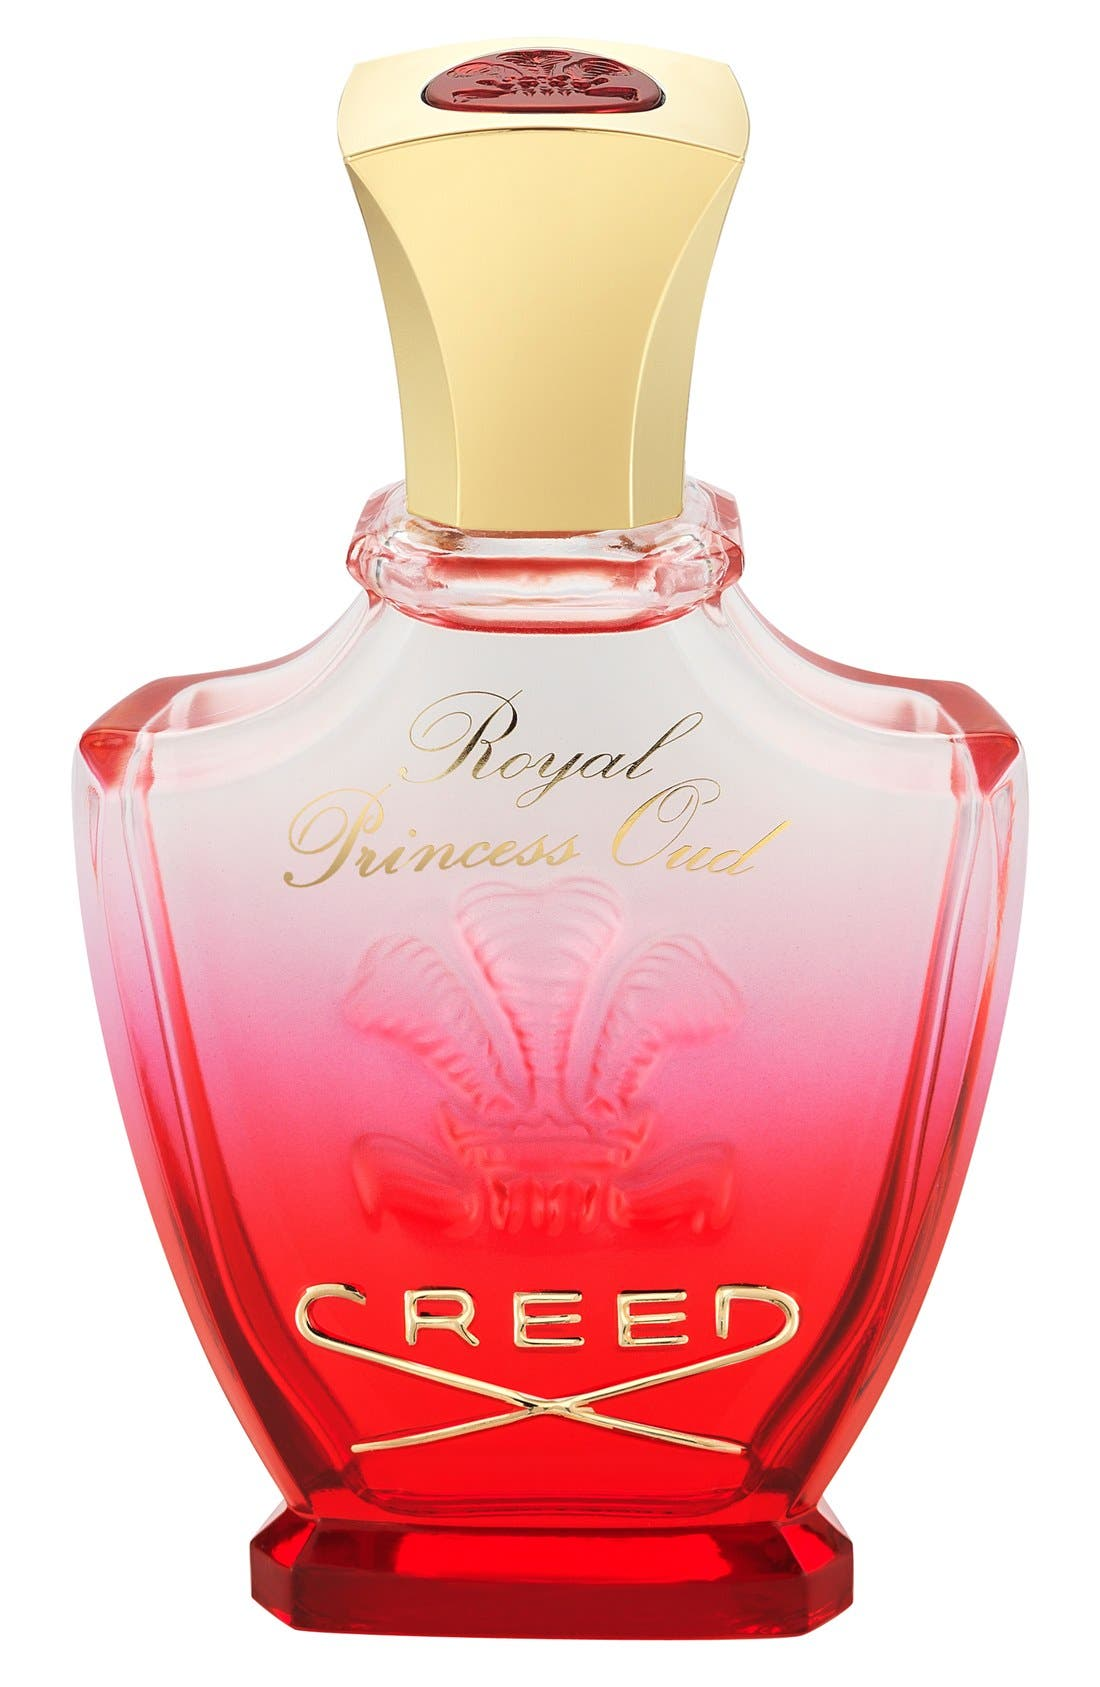 Royal Princess Oud Fragrance